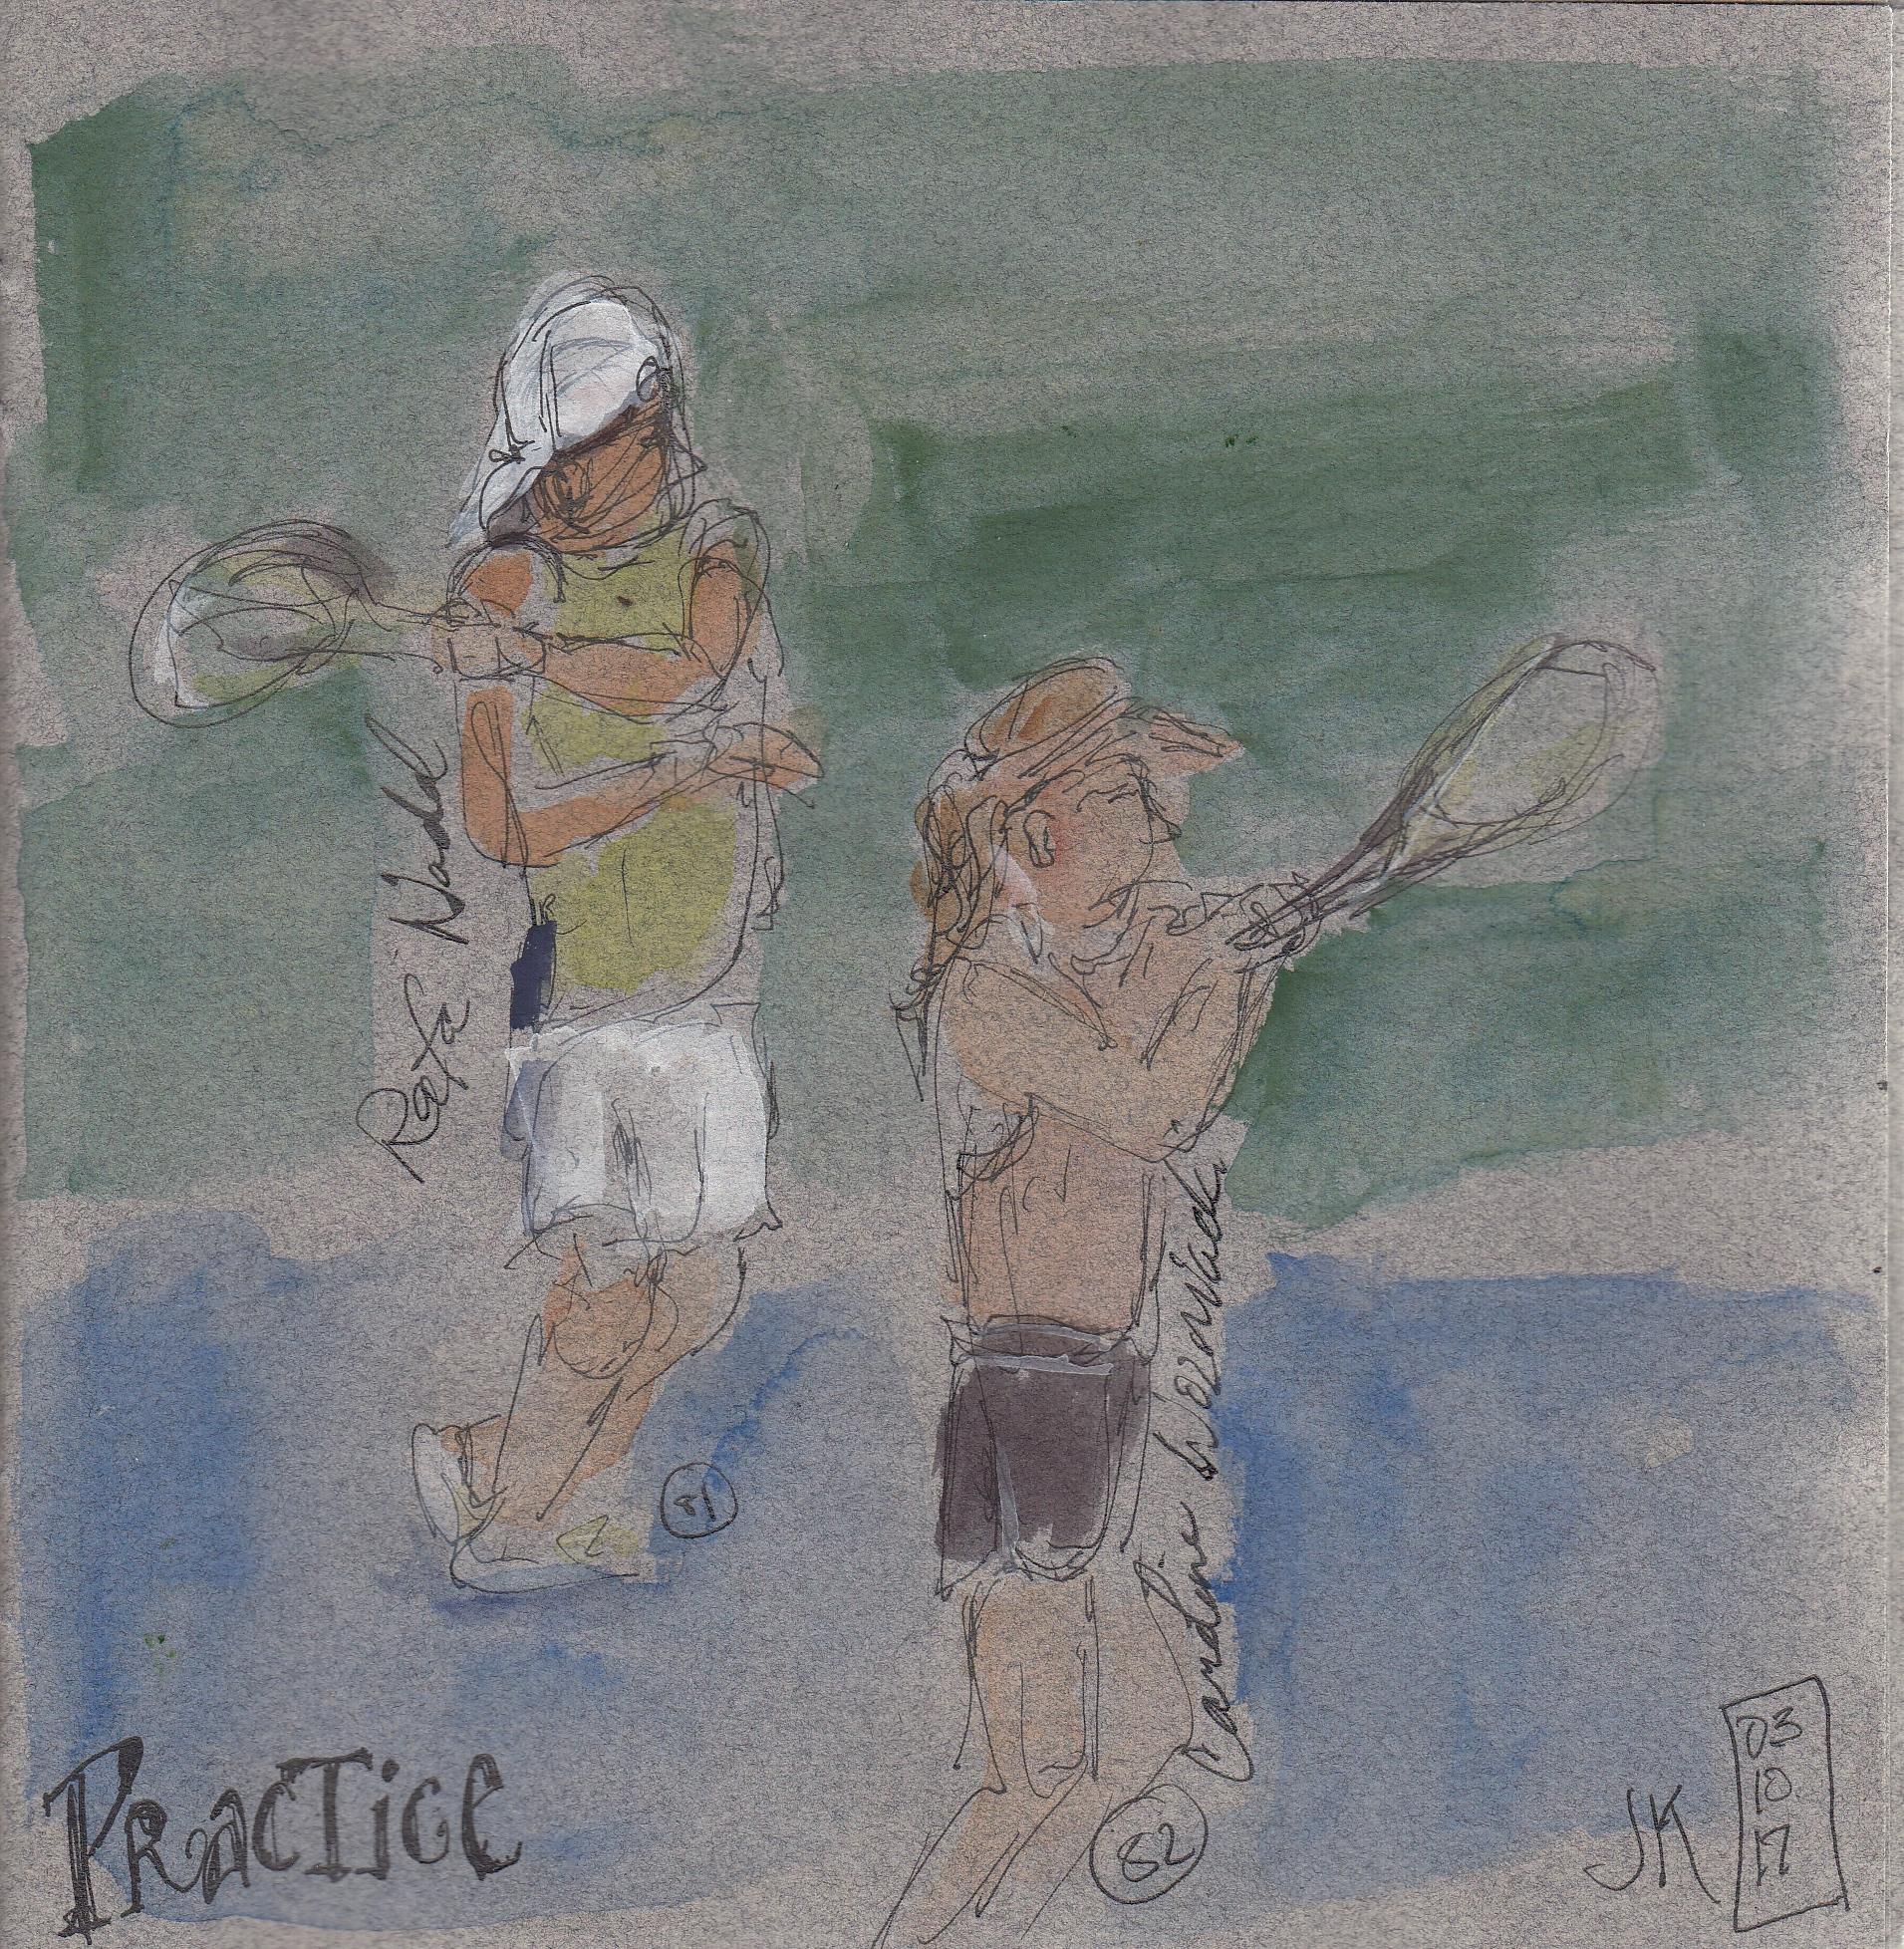 Nos. 81 & 82 - Rafa Nadal & Caroline Wozniacki practicing